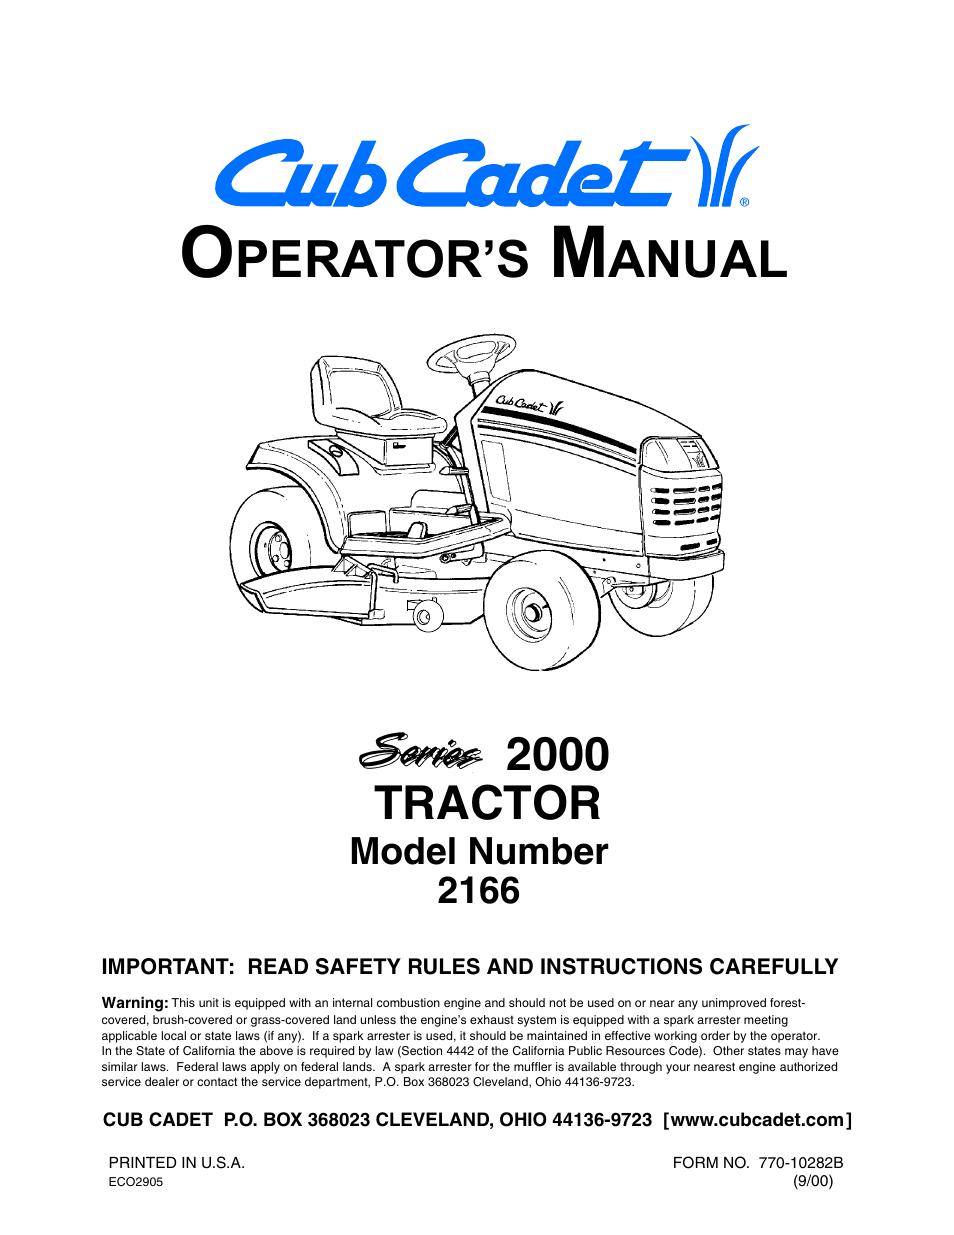 cub cadet 2166 user manual 60 pages rh manualsdir com cub cadet model 2166 manual cub cadet 2166 operator's manual